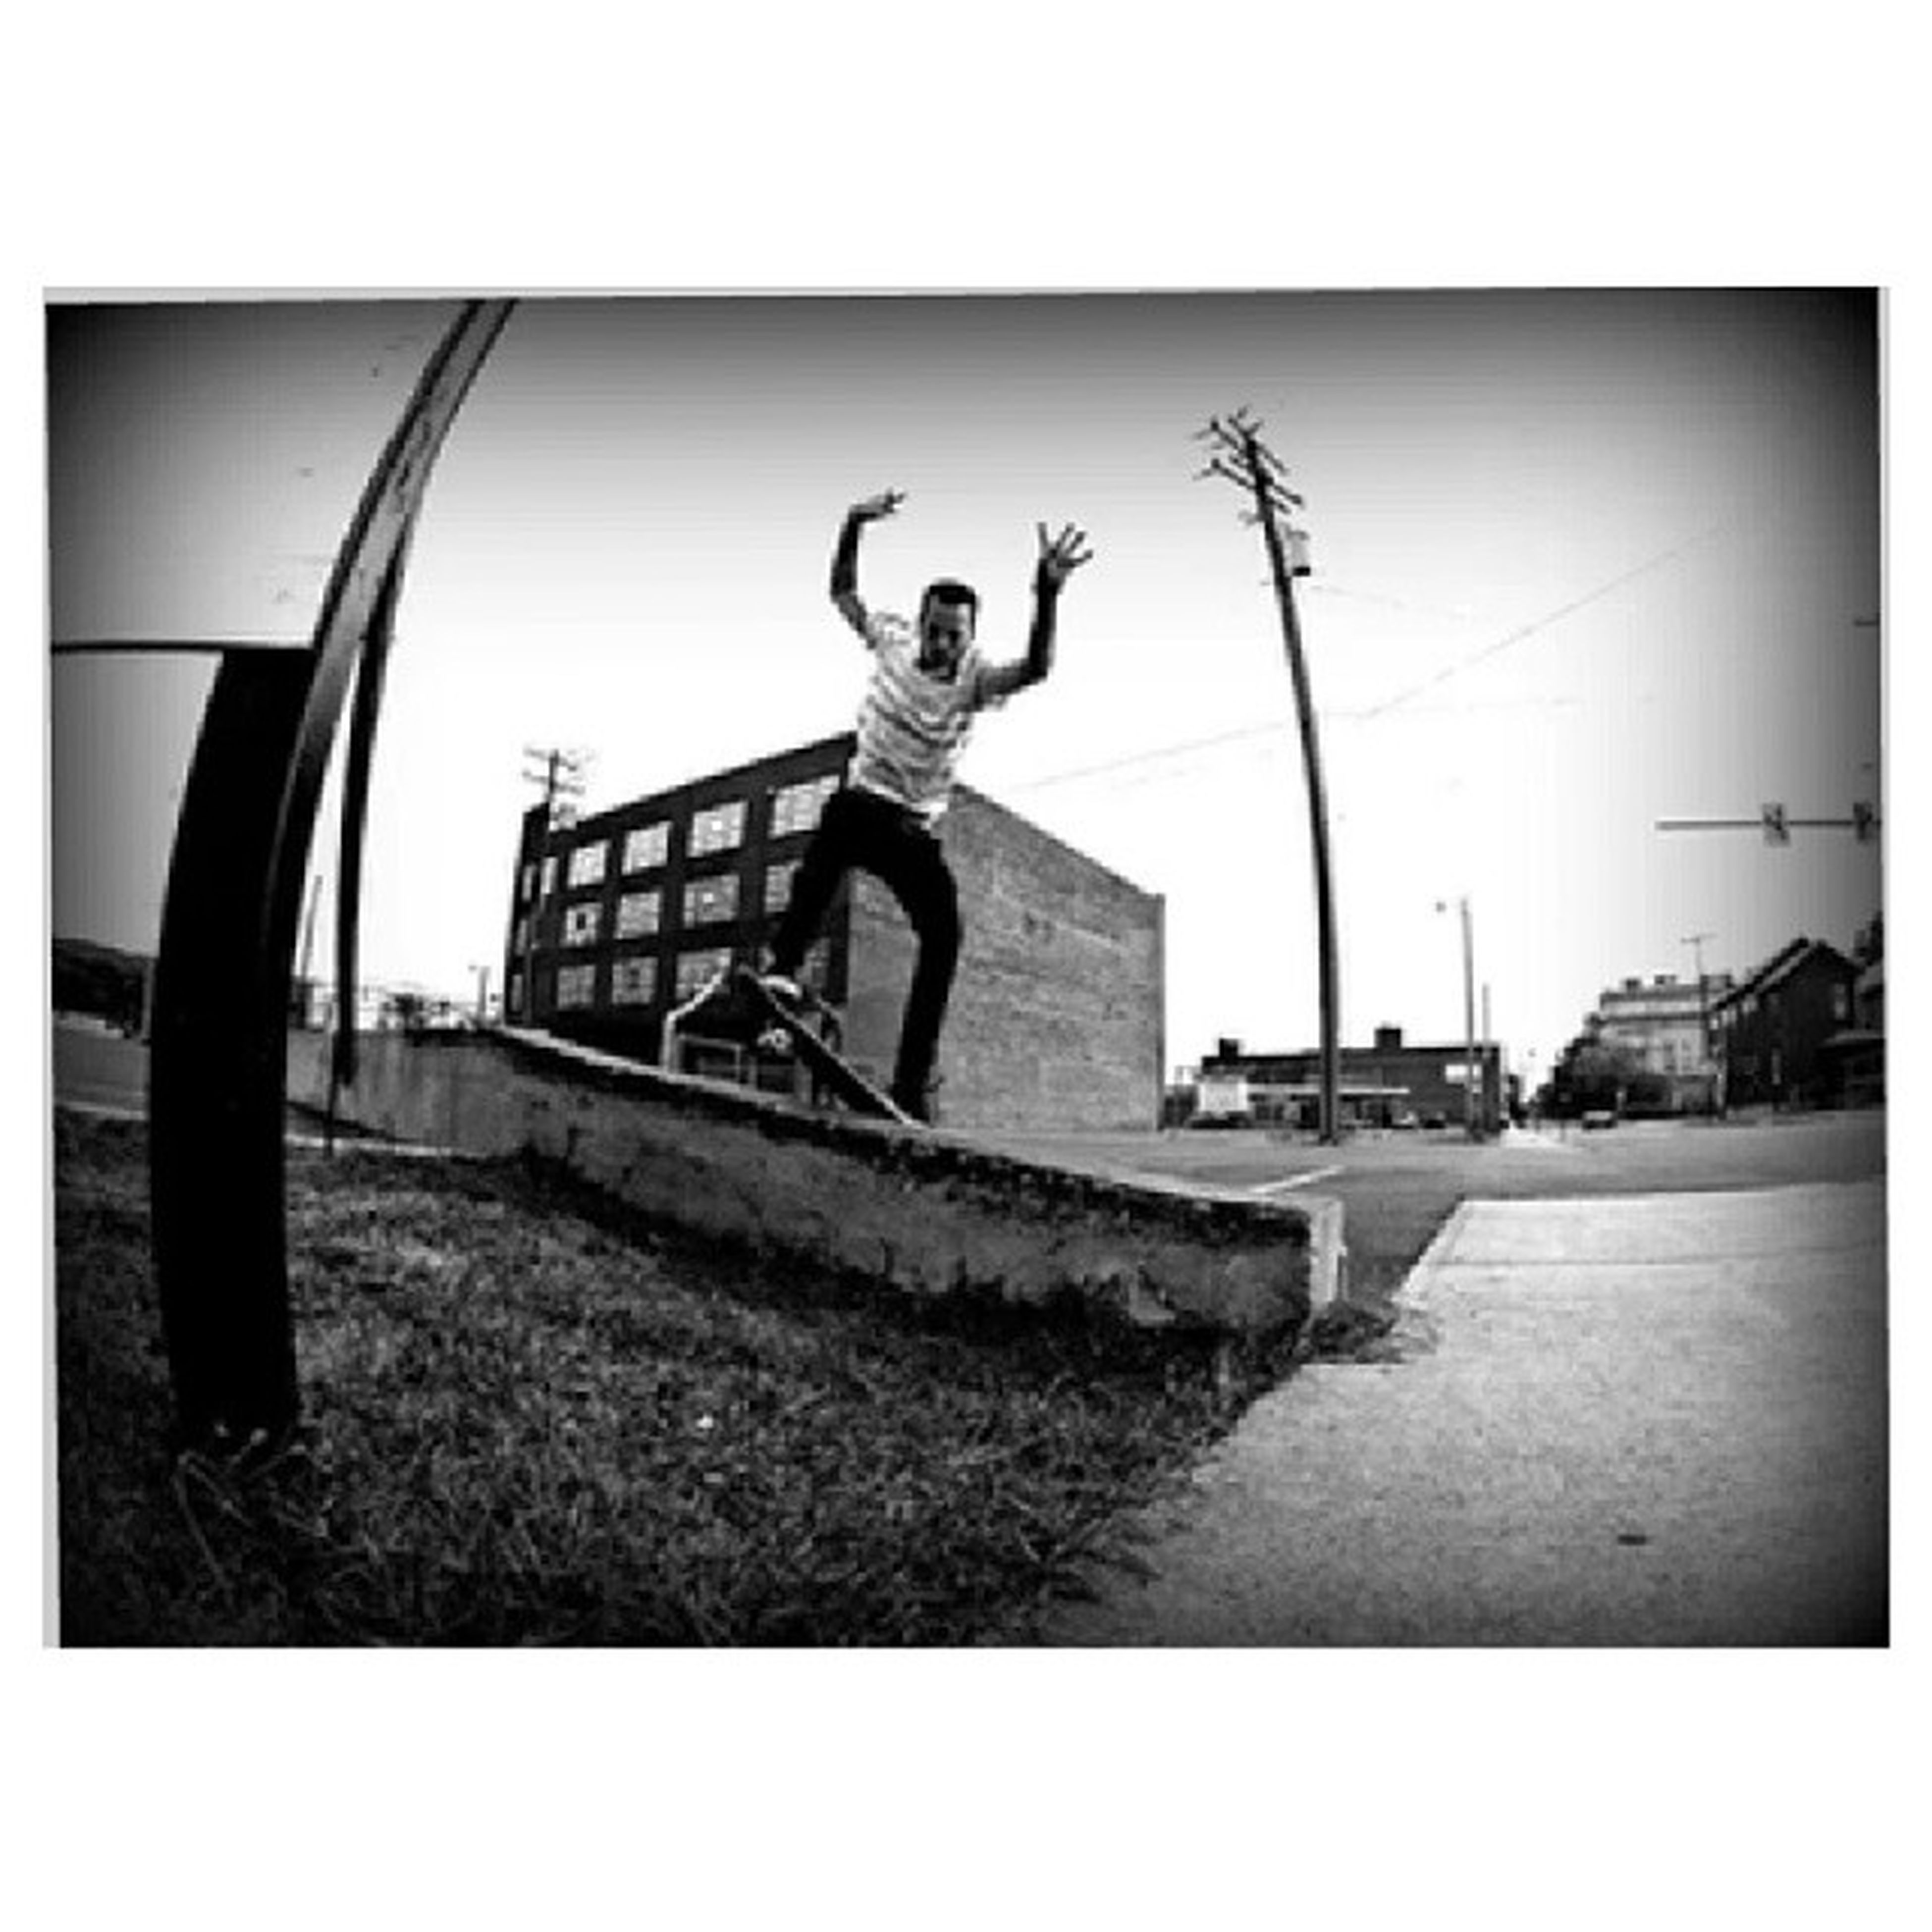 Skateboarding Skatelife Ljsorber Nesc Nepa Wilkesbarre